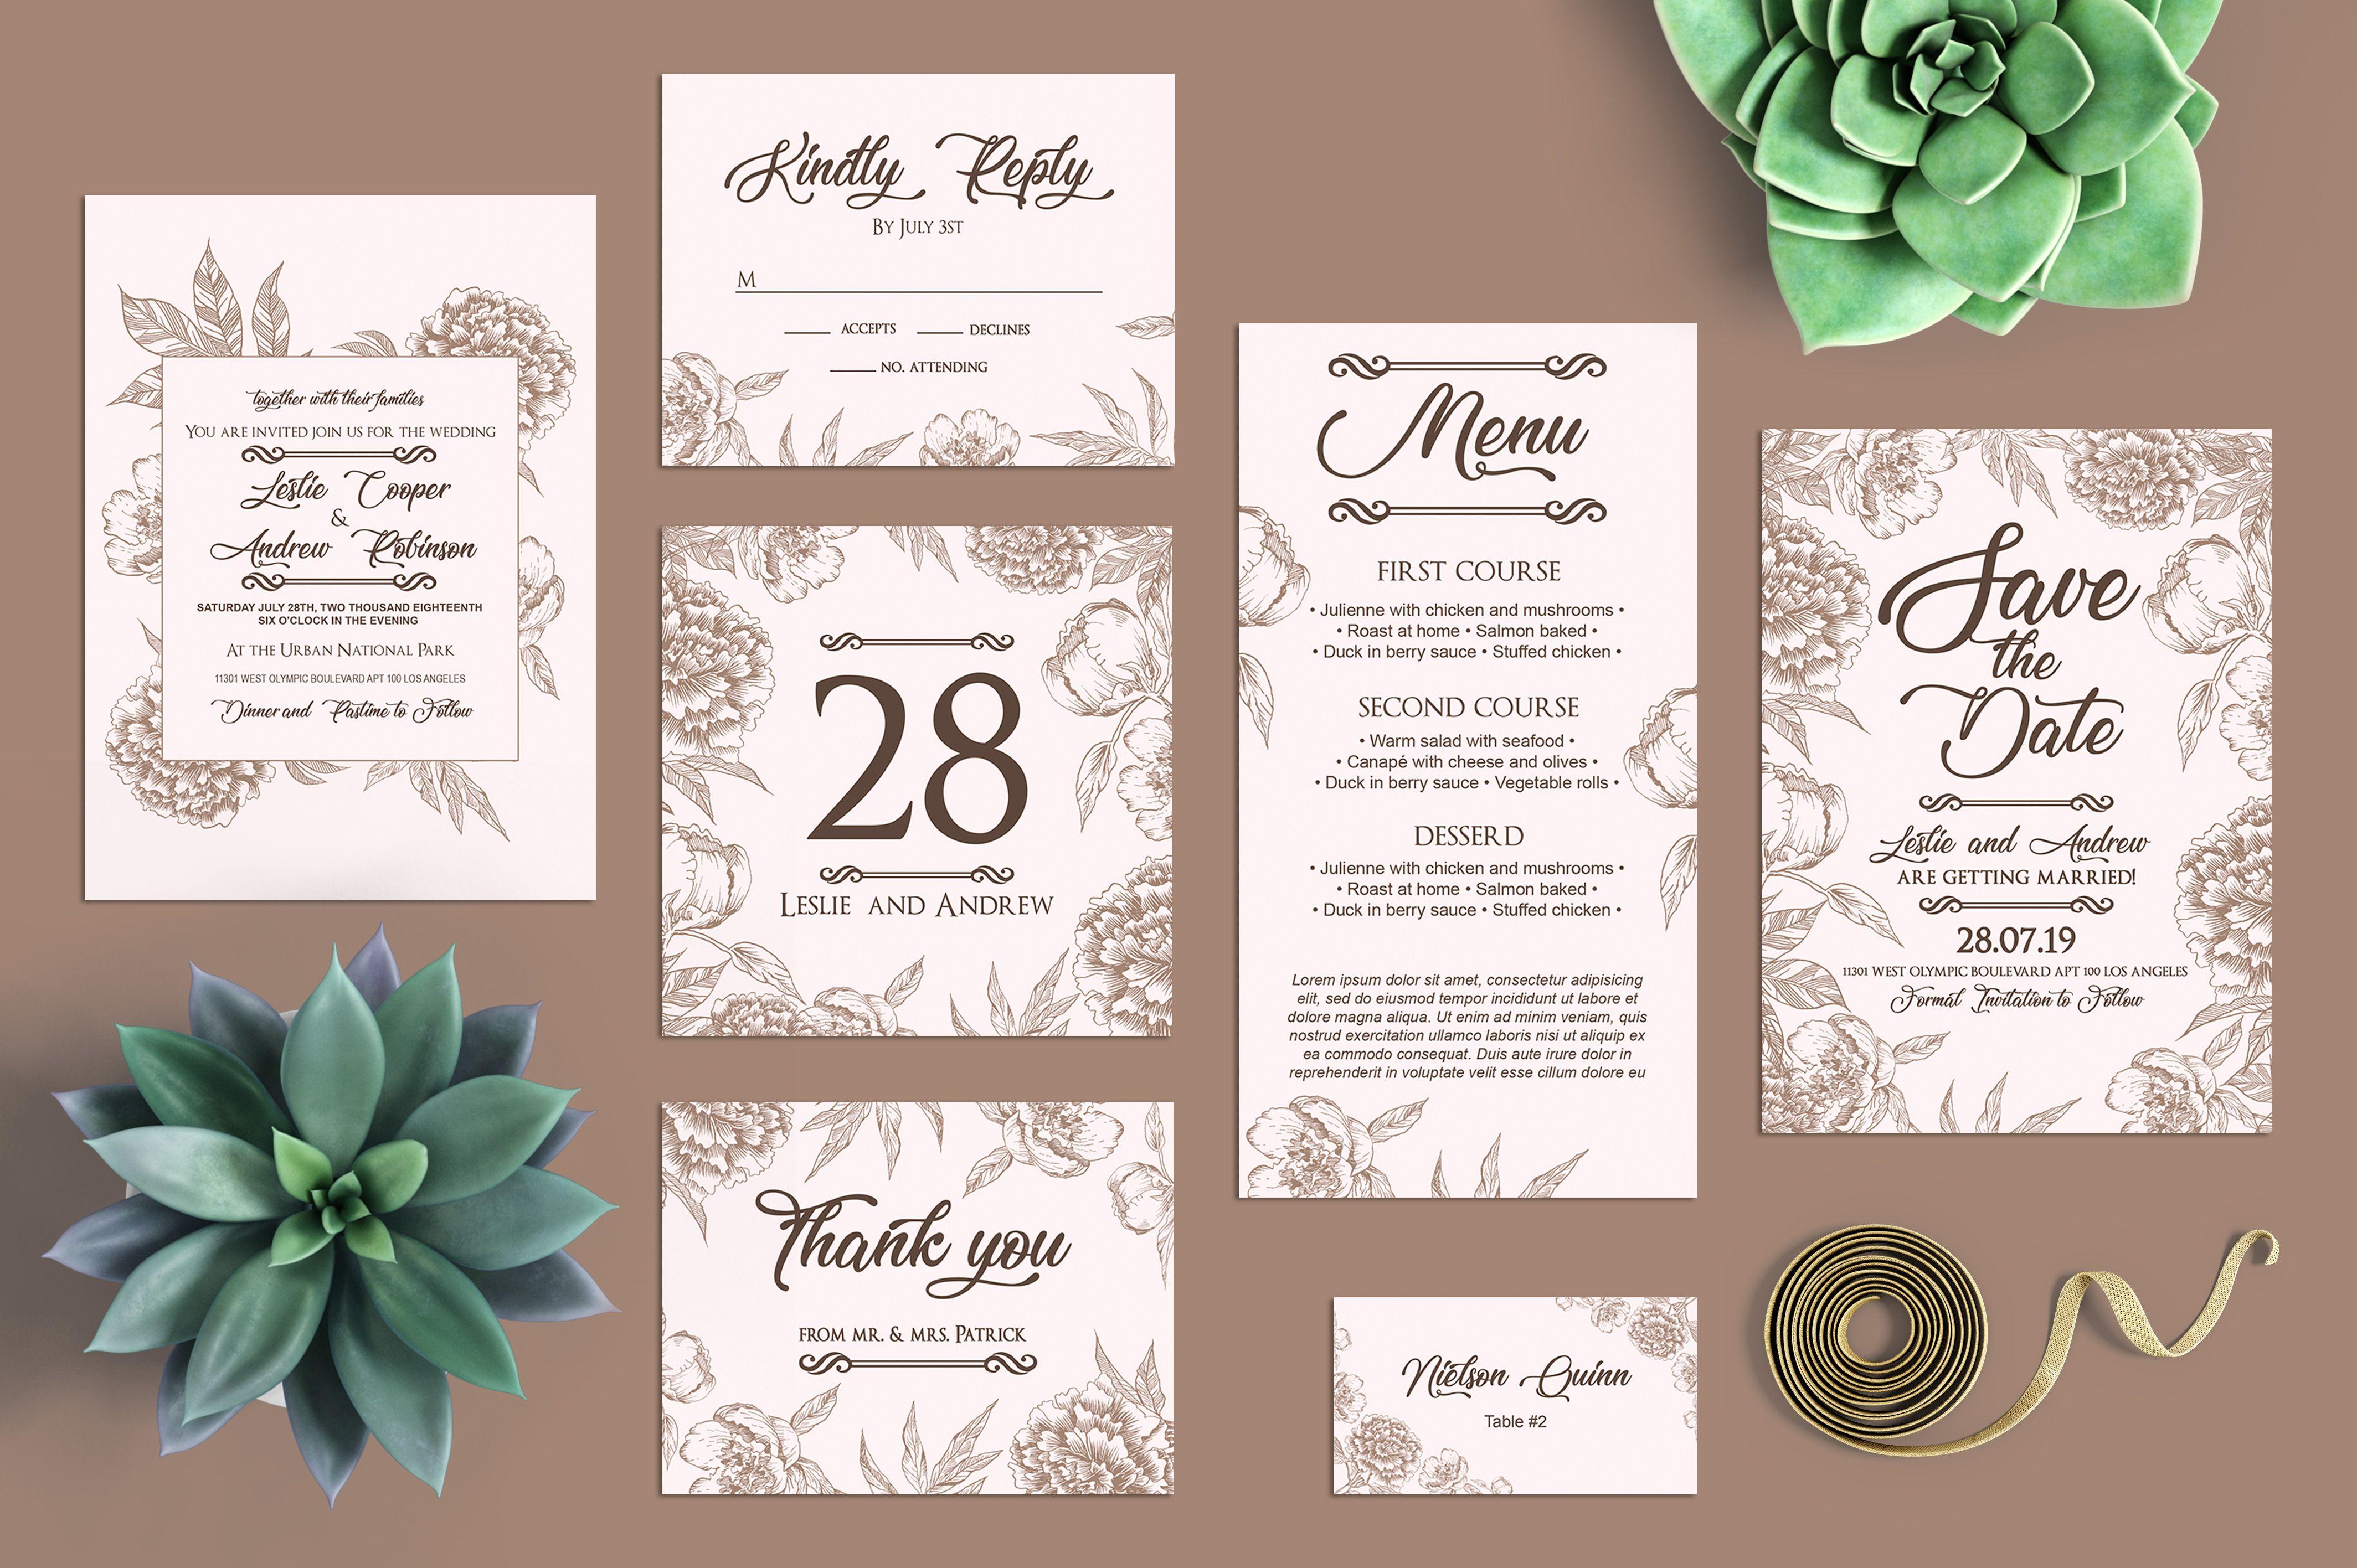 Free Minimalist Peonies Wedding Templates Package In Psd